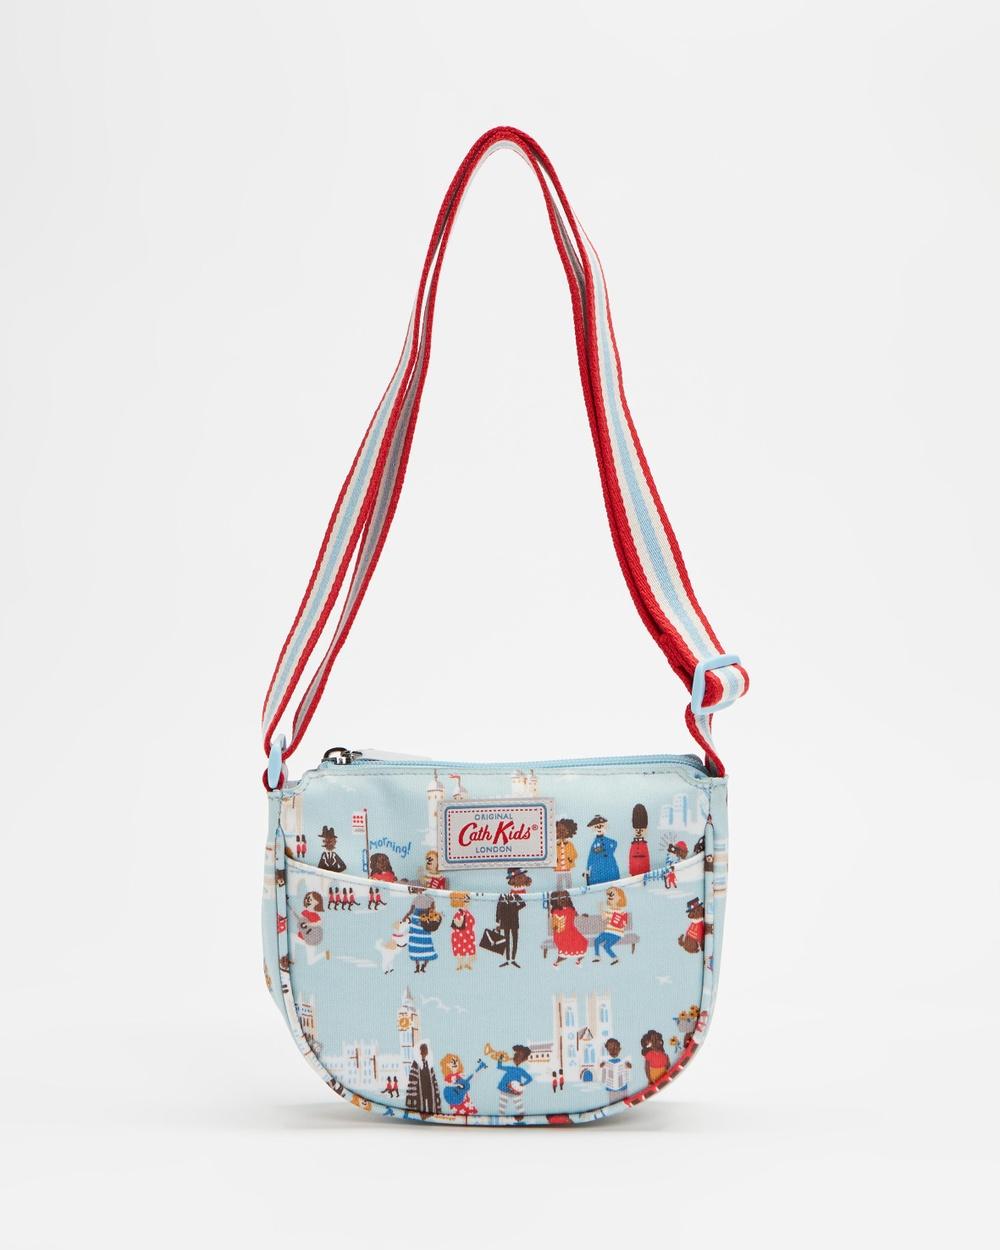 Cath Kidston Handbag Kids Handbags London People